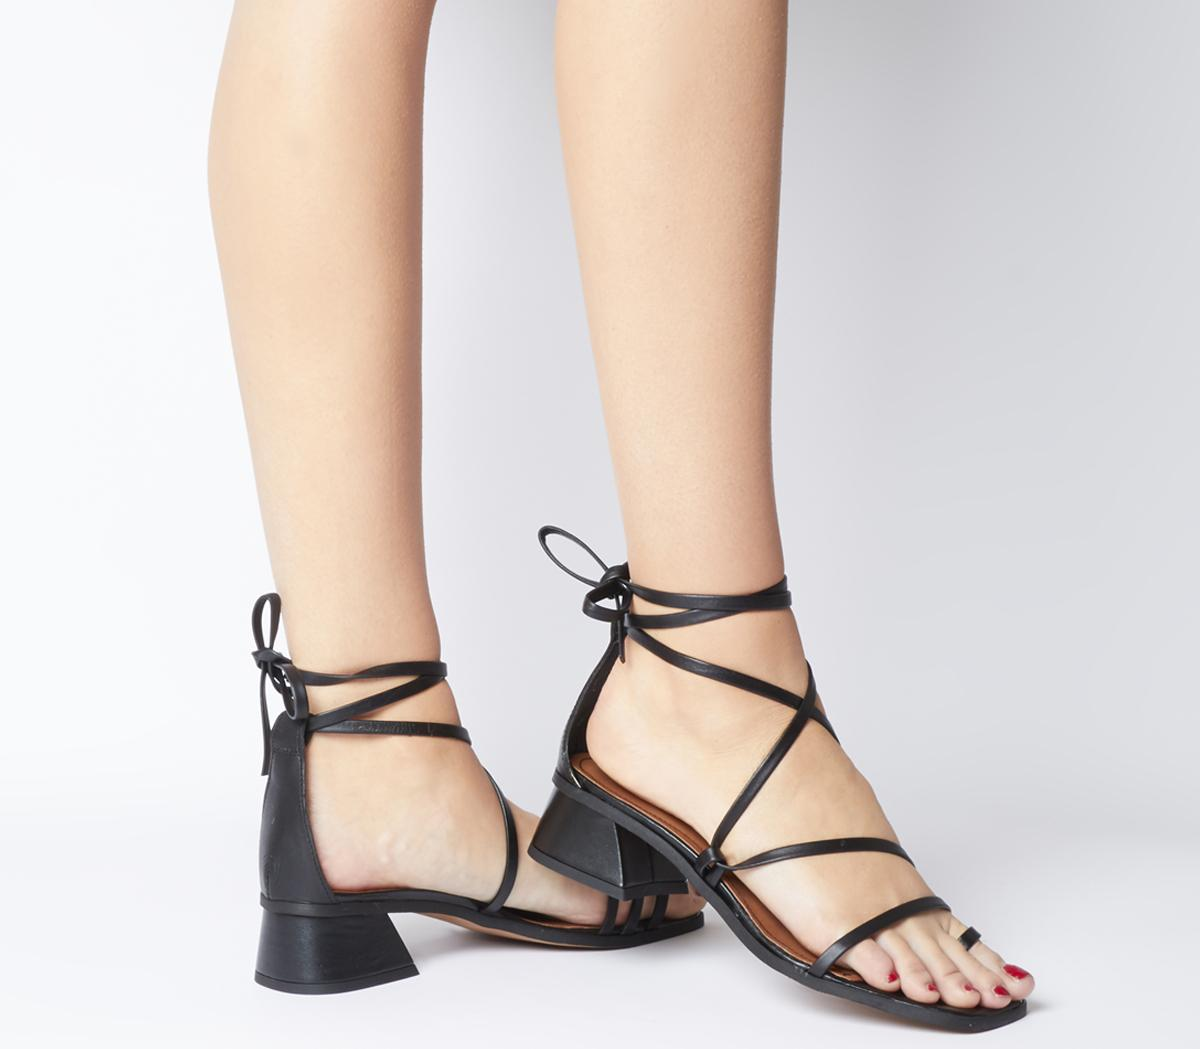 Minimalist Toe Loop Strappy Heels